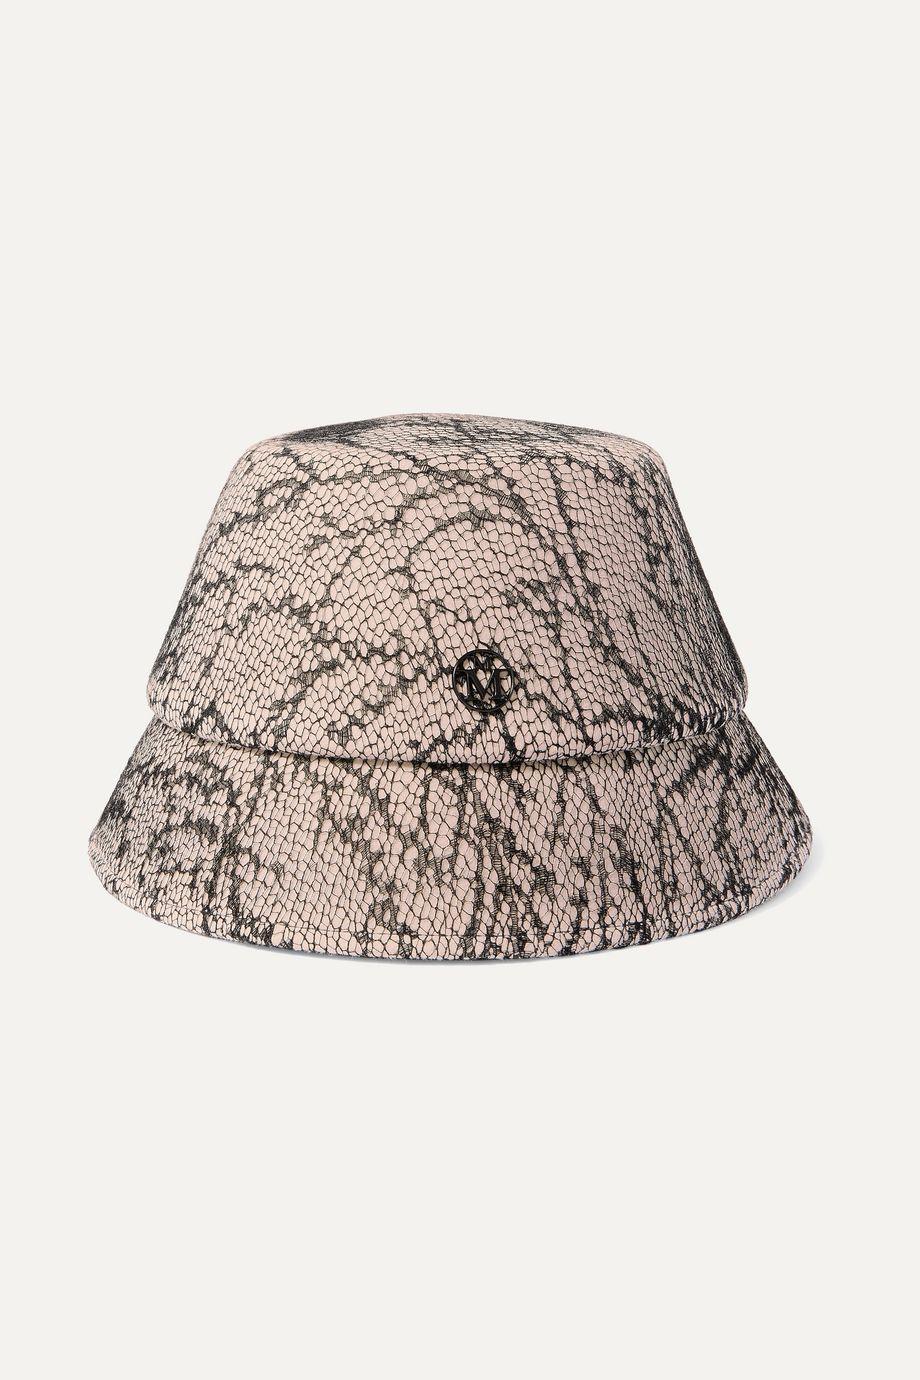 Maison Michel Souna rabbit-felt and lace bucket hat